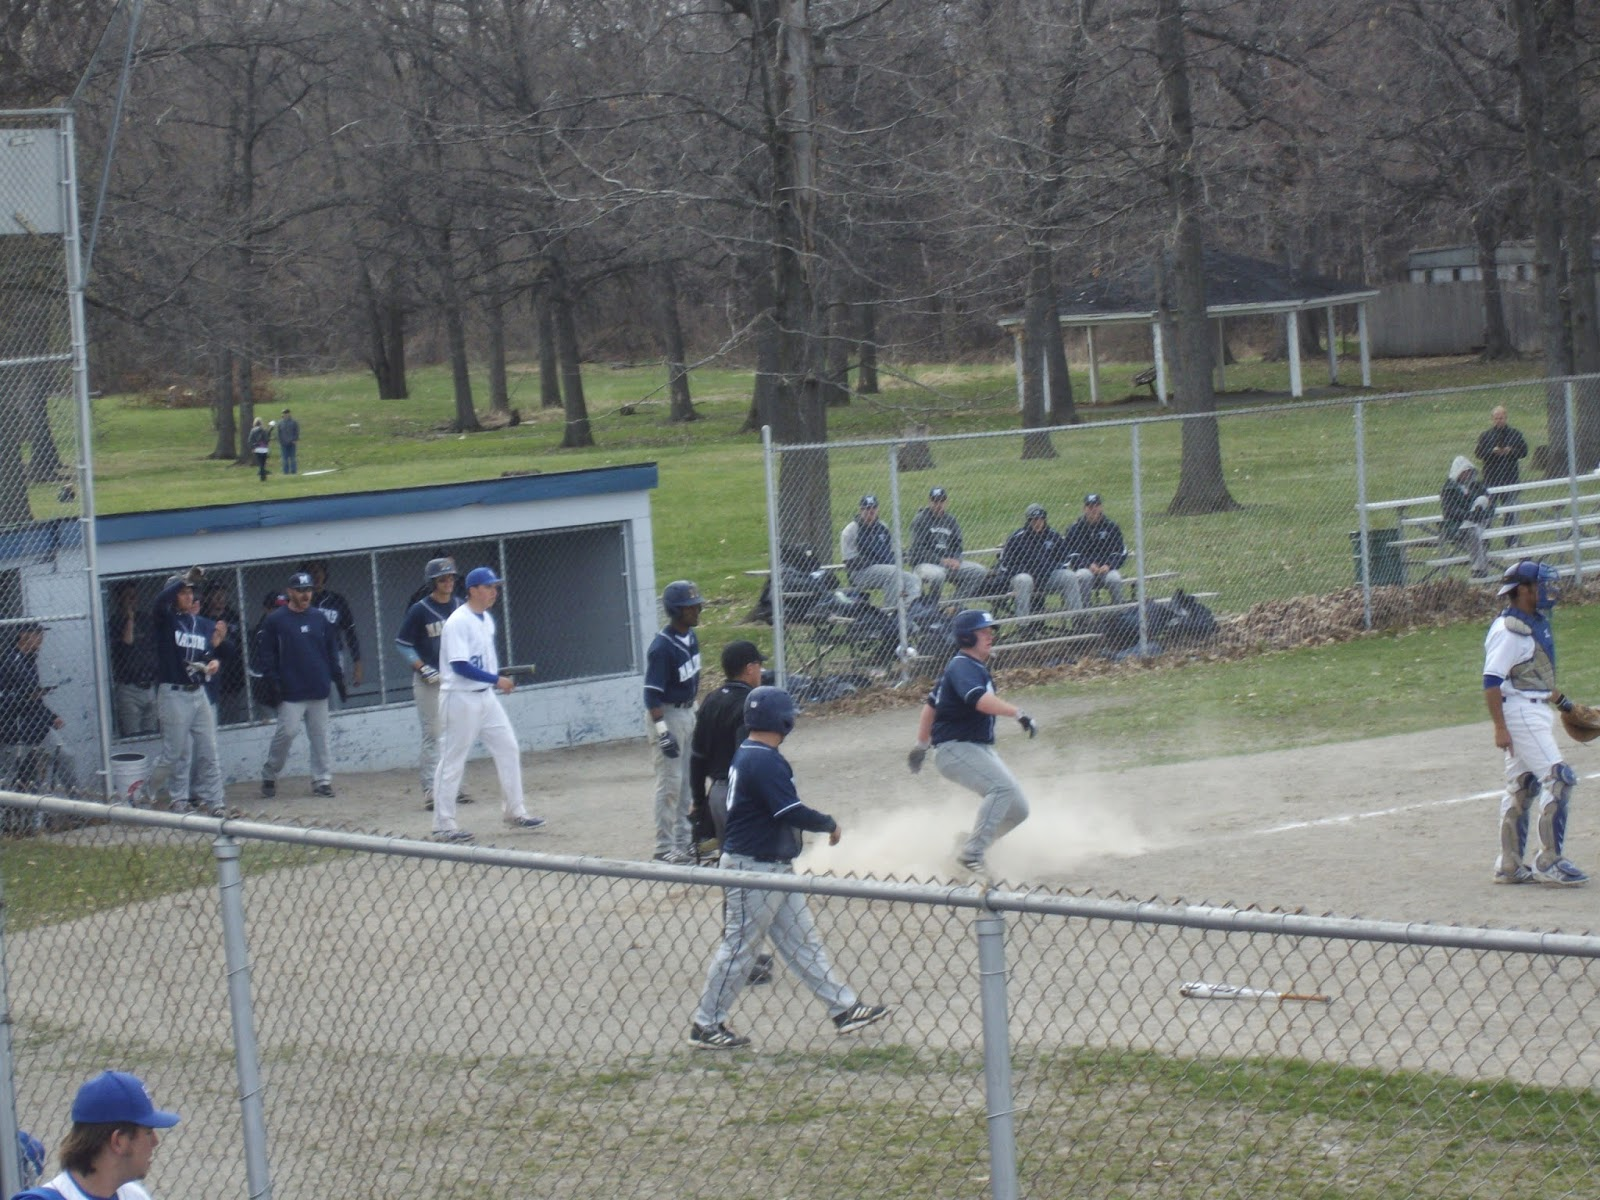 mitten state sports report: college baseball hfcc vs. mcc